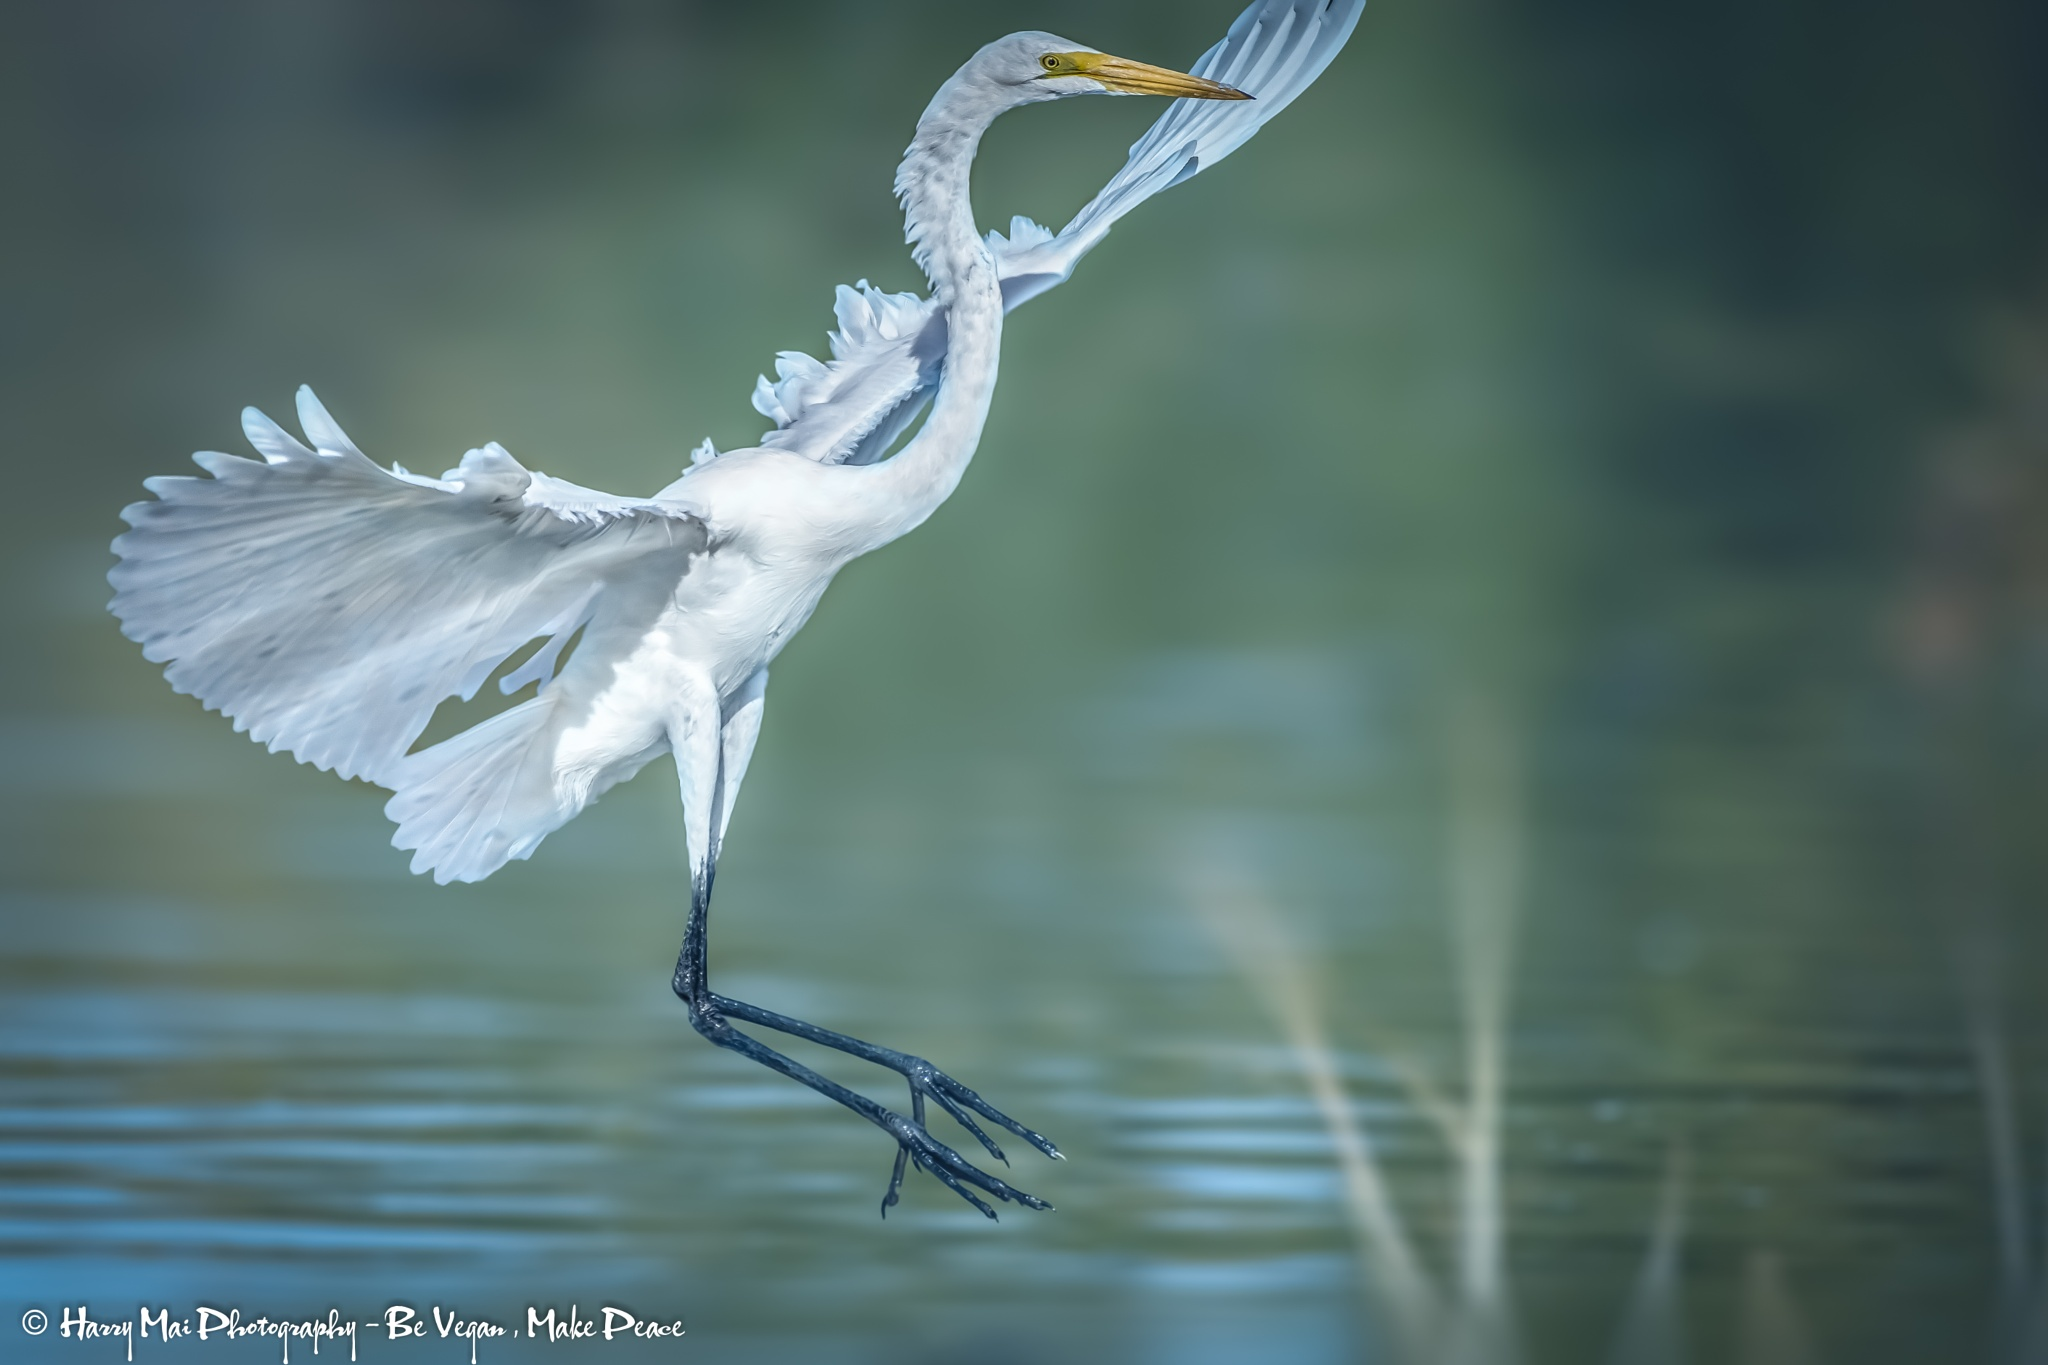 Morning Dance by Harry Mai